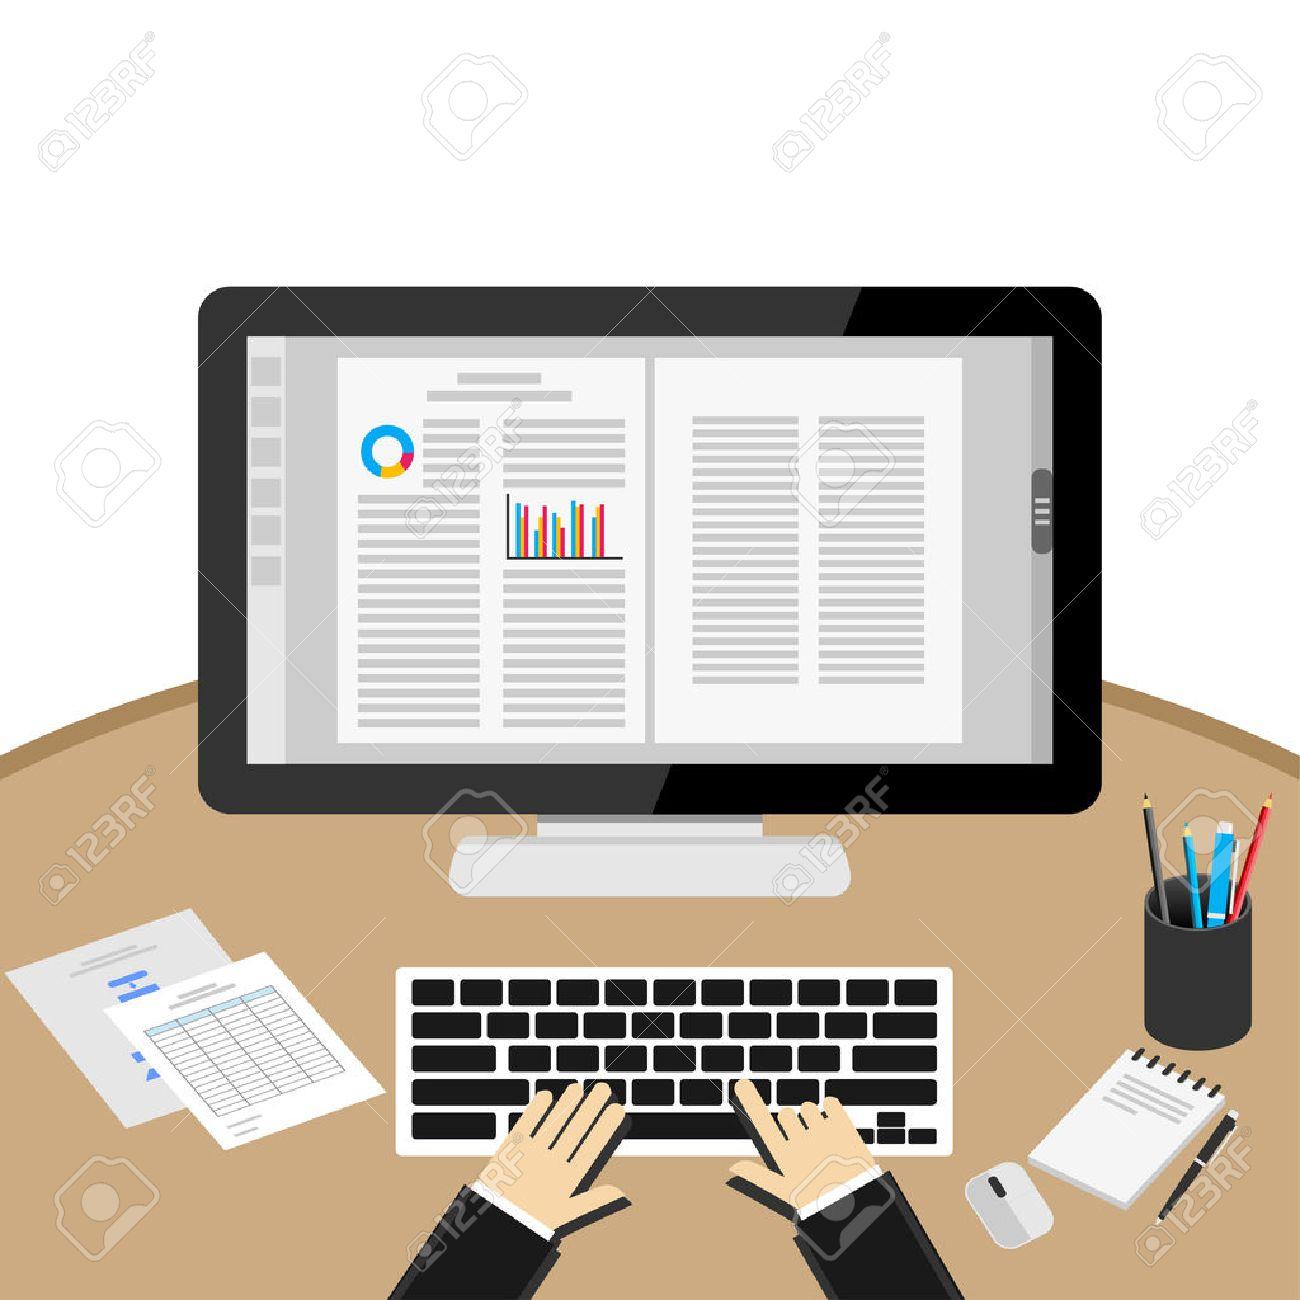 Businessman Using Computer At Desk. Word processor application. - 66897413